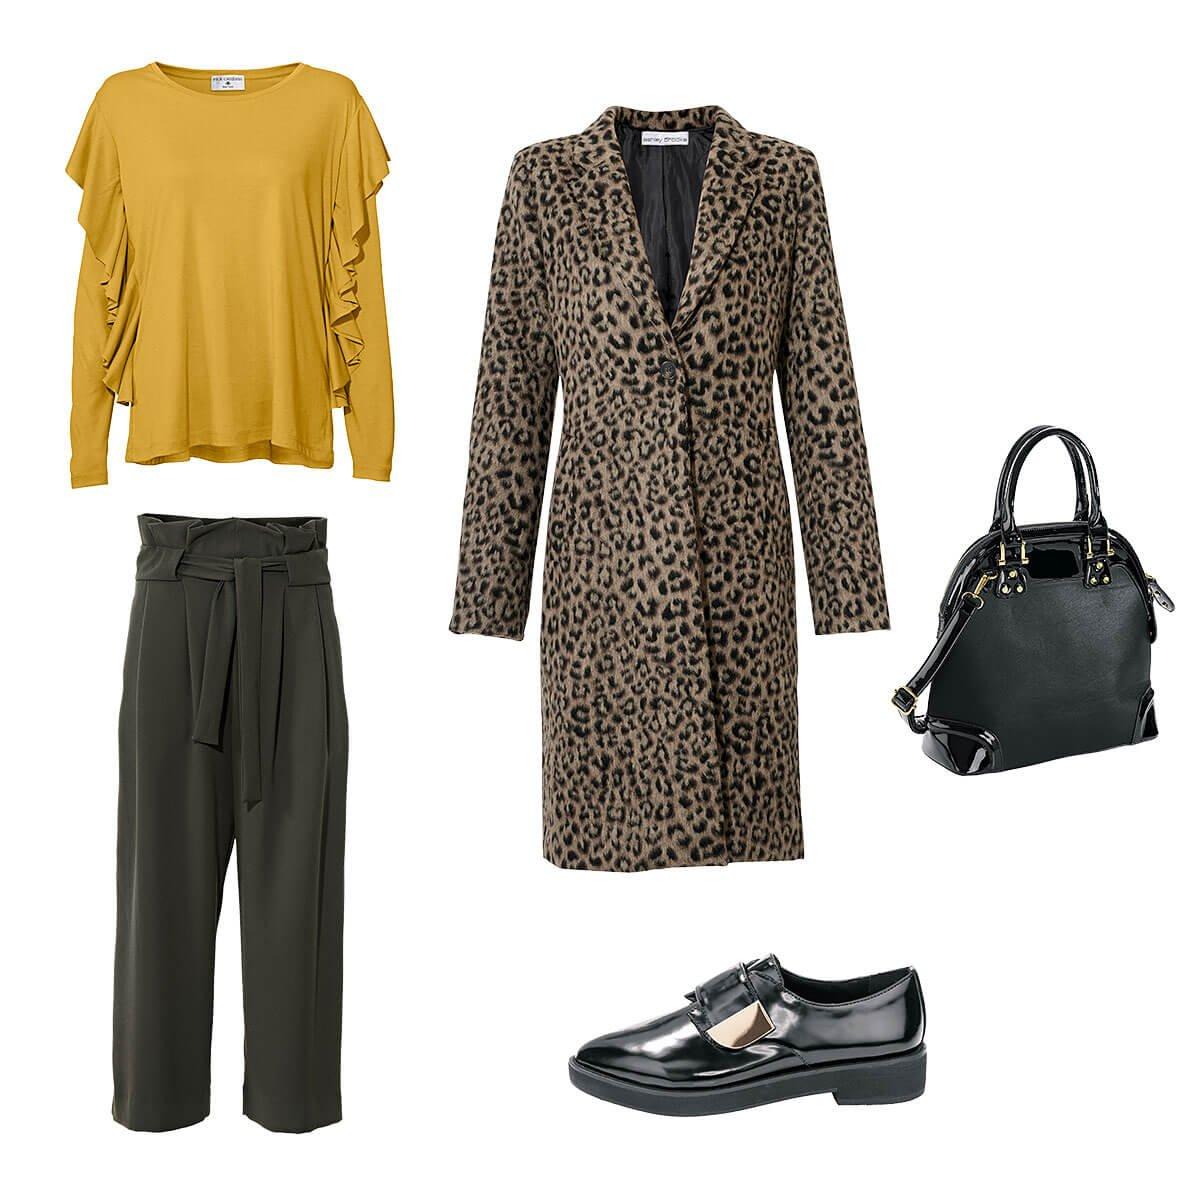 Animal_Leo_outfit_oktober_kollage_2